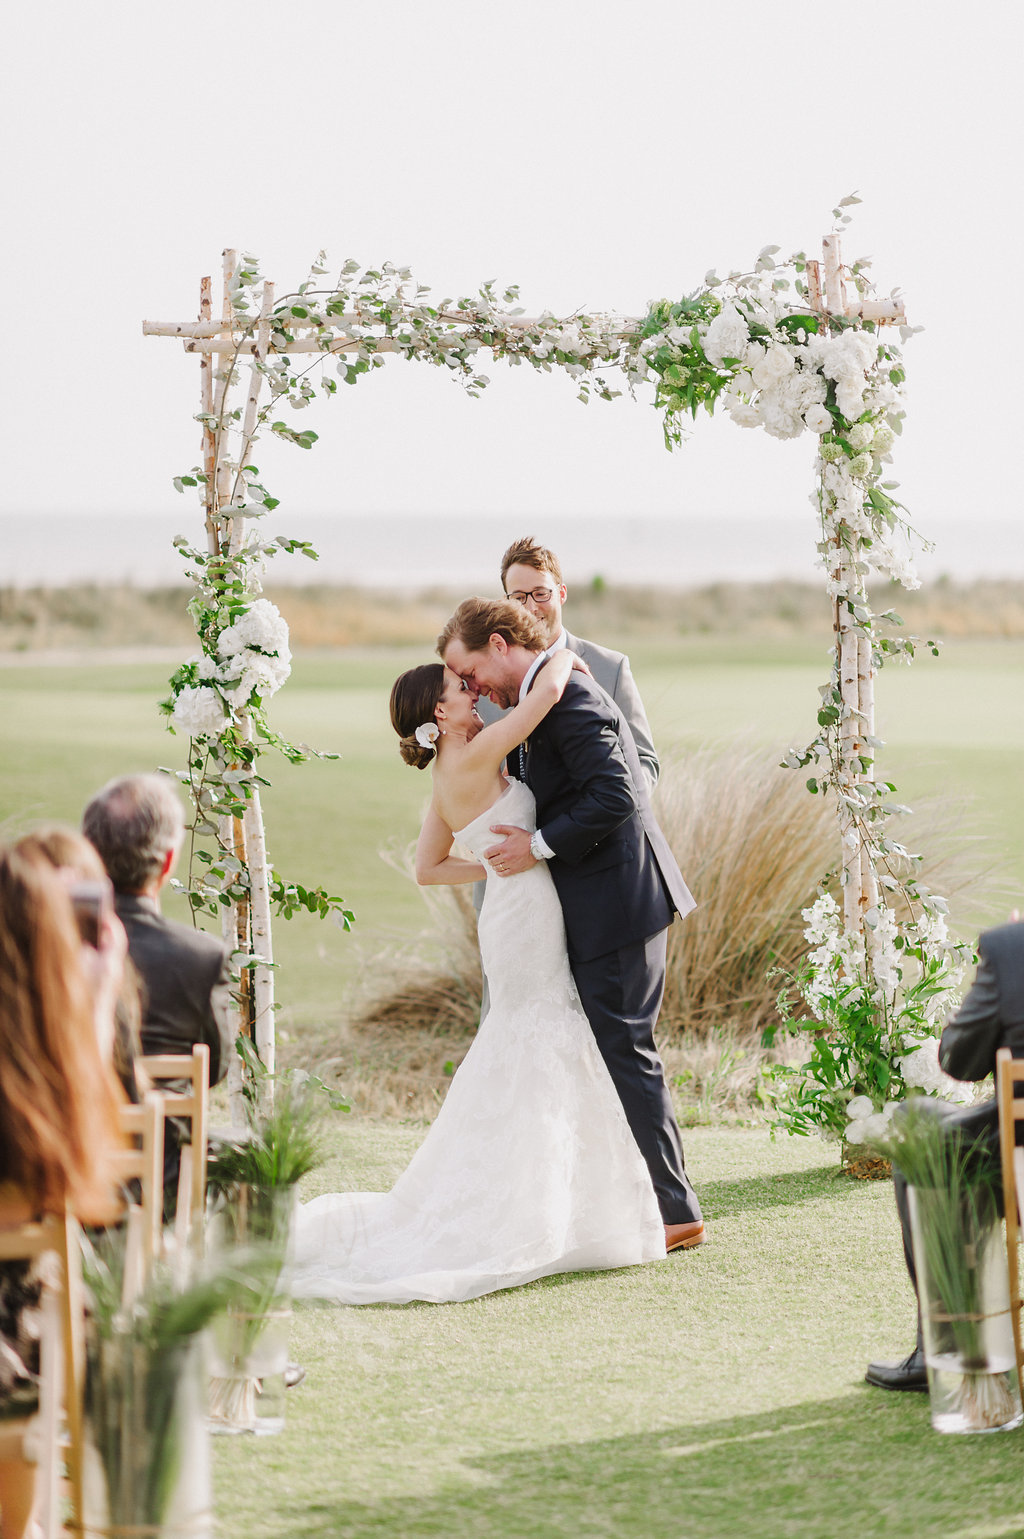 Events by Reagan, Ocean Course Wedding, Ceremony Arbor, Kiawah, Charleston, Destination Wedding